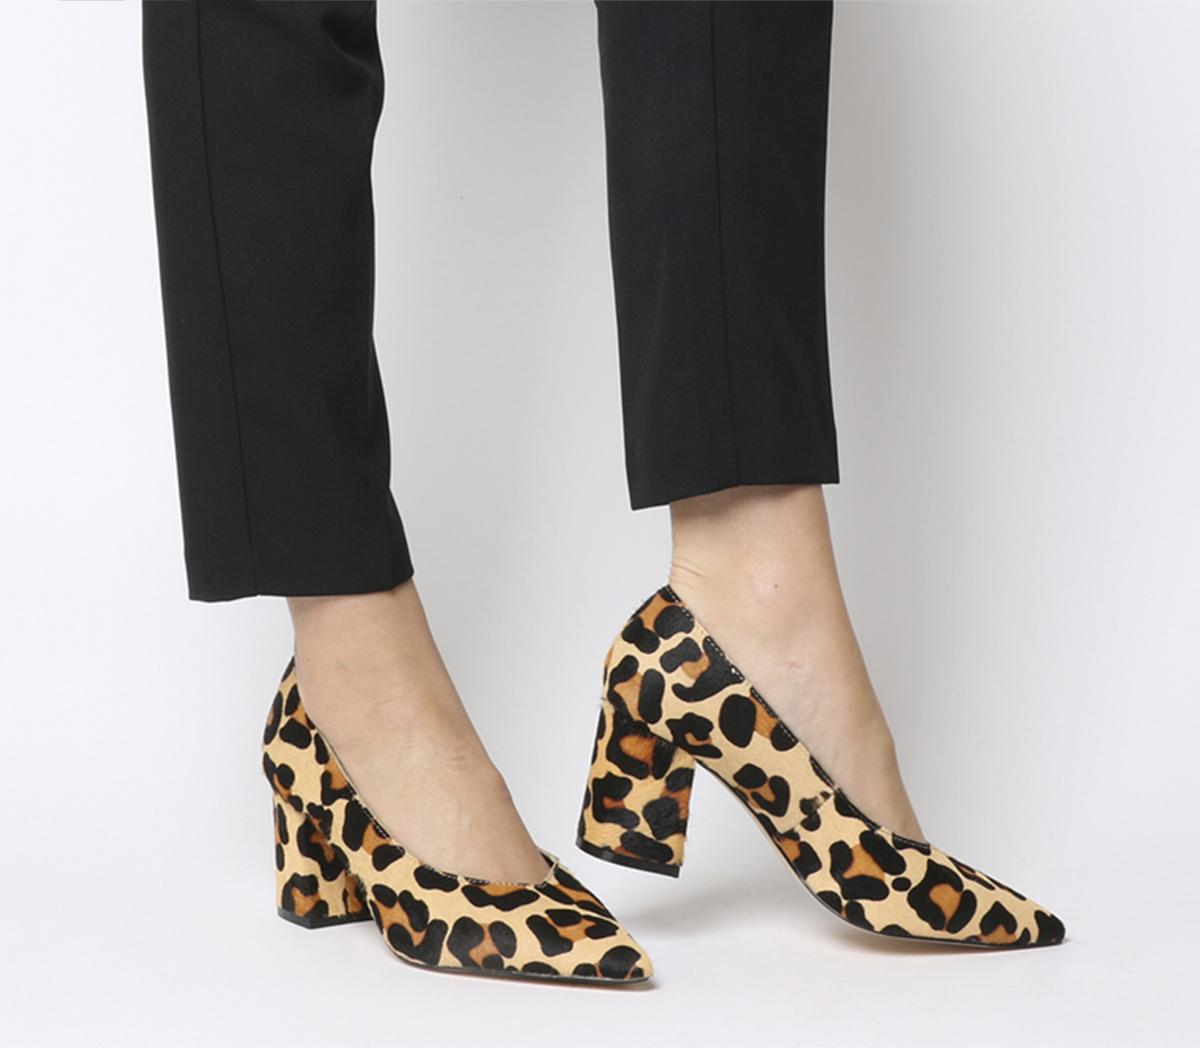 leopard pointed heels